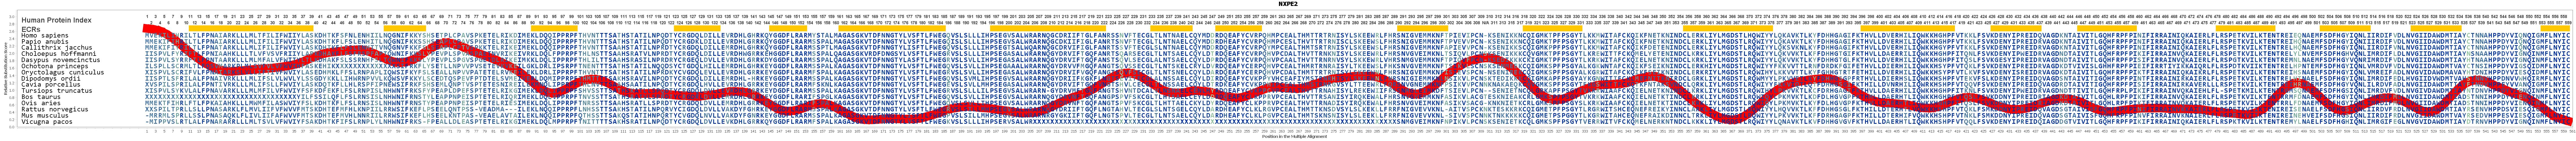 NXPE2 Gene - GeneCards | NXPE2 Protein | NXPE2 Antibody